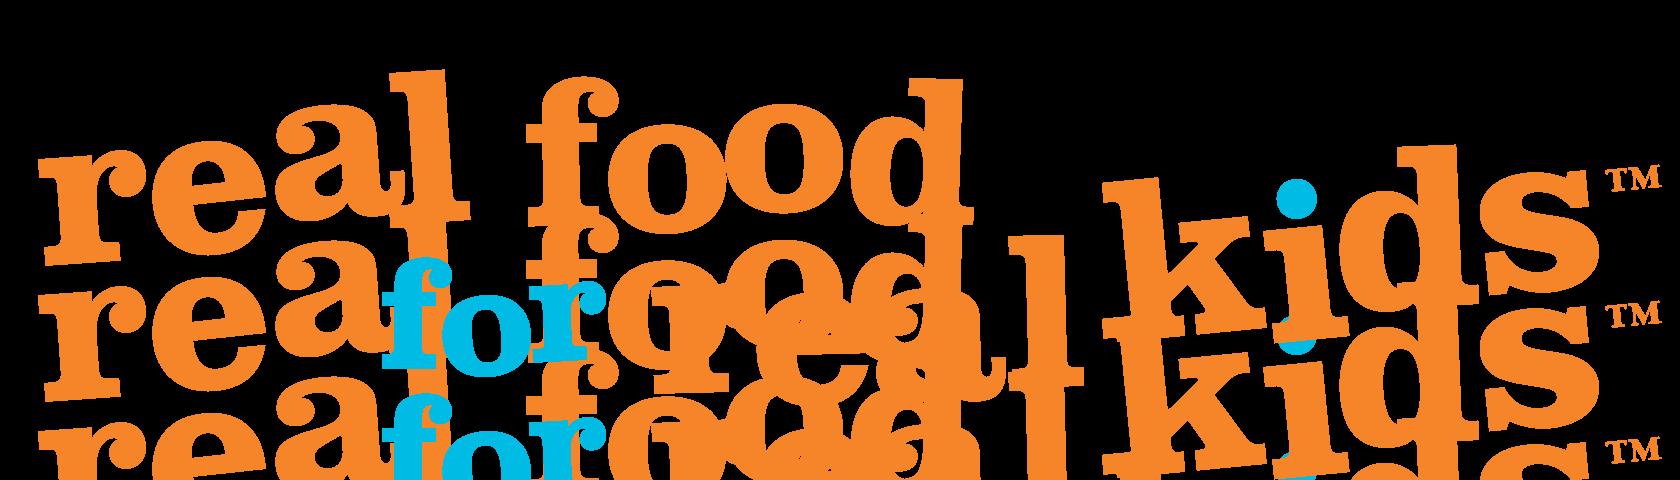 RFRK_Logo.png